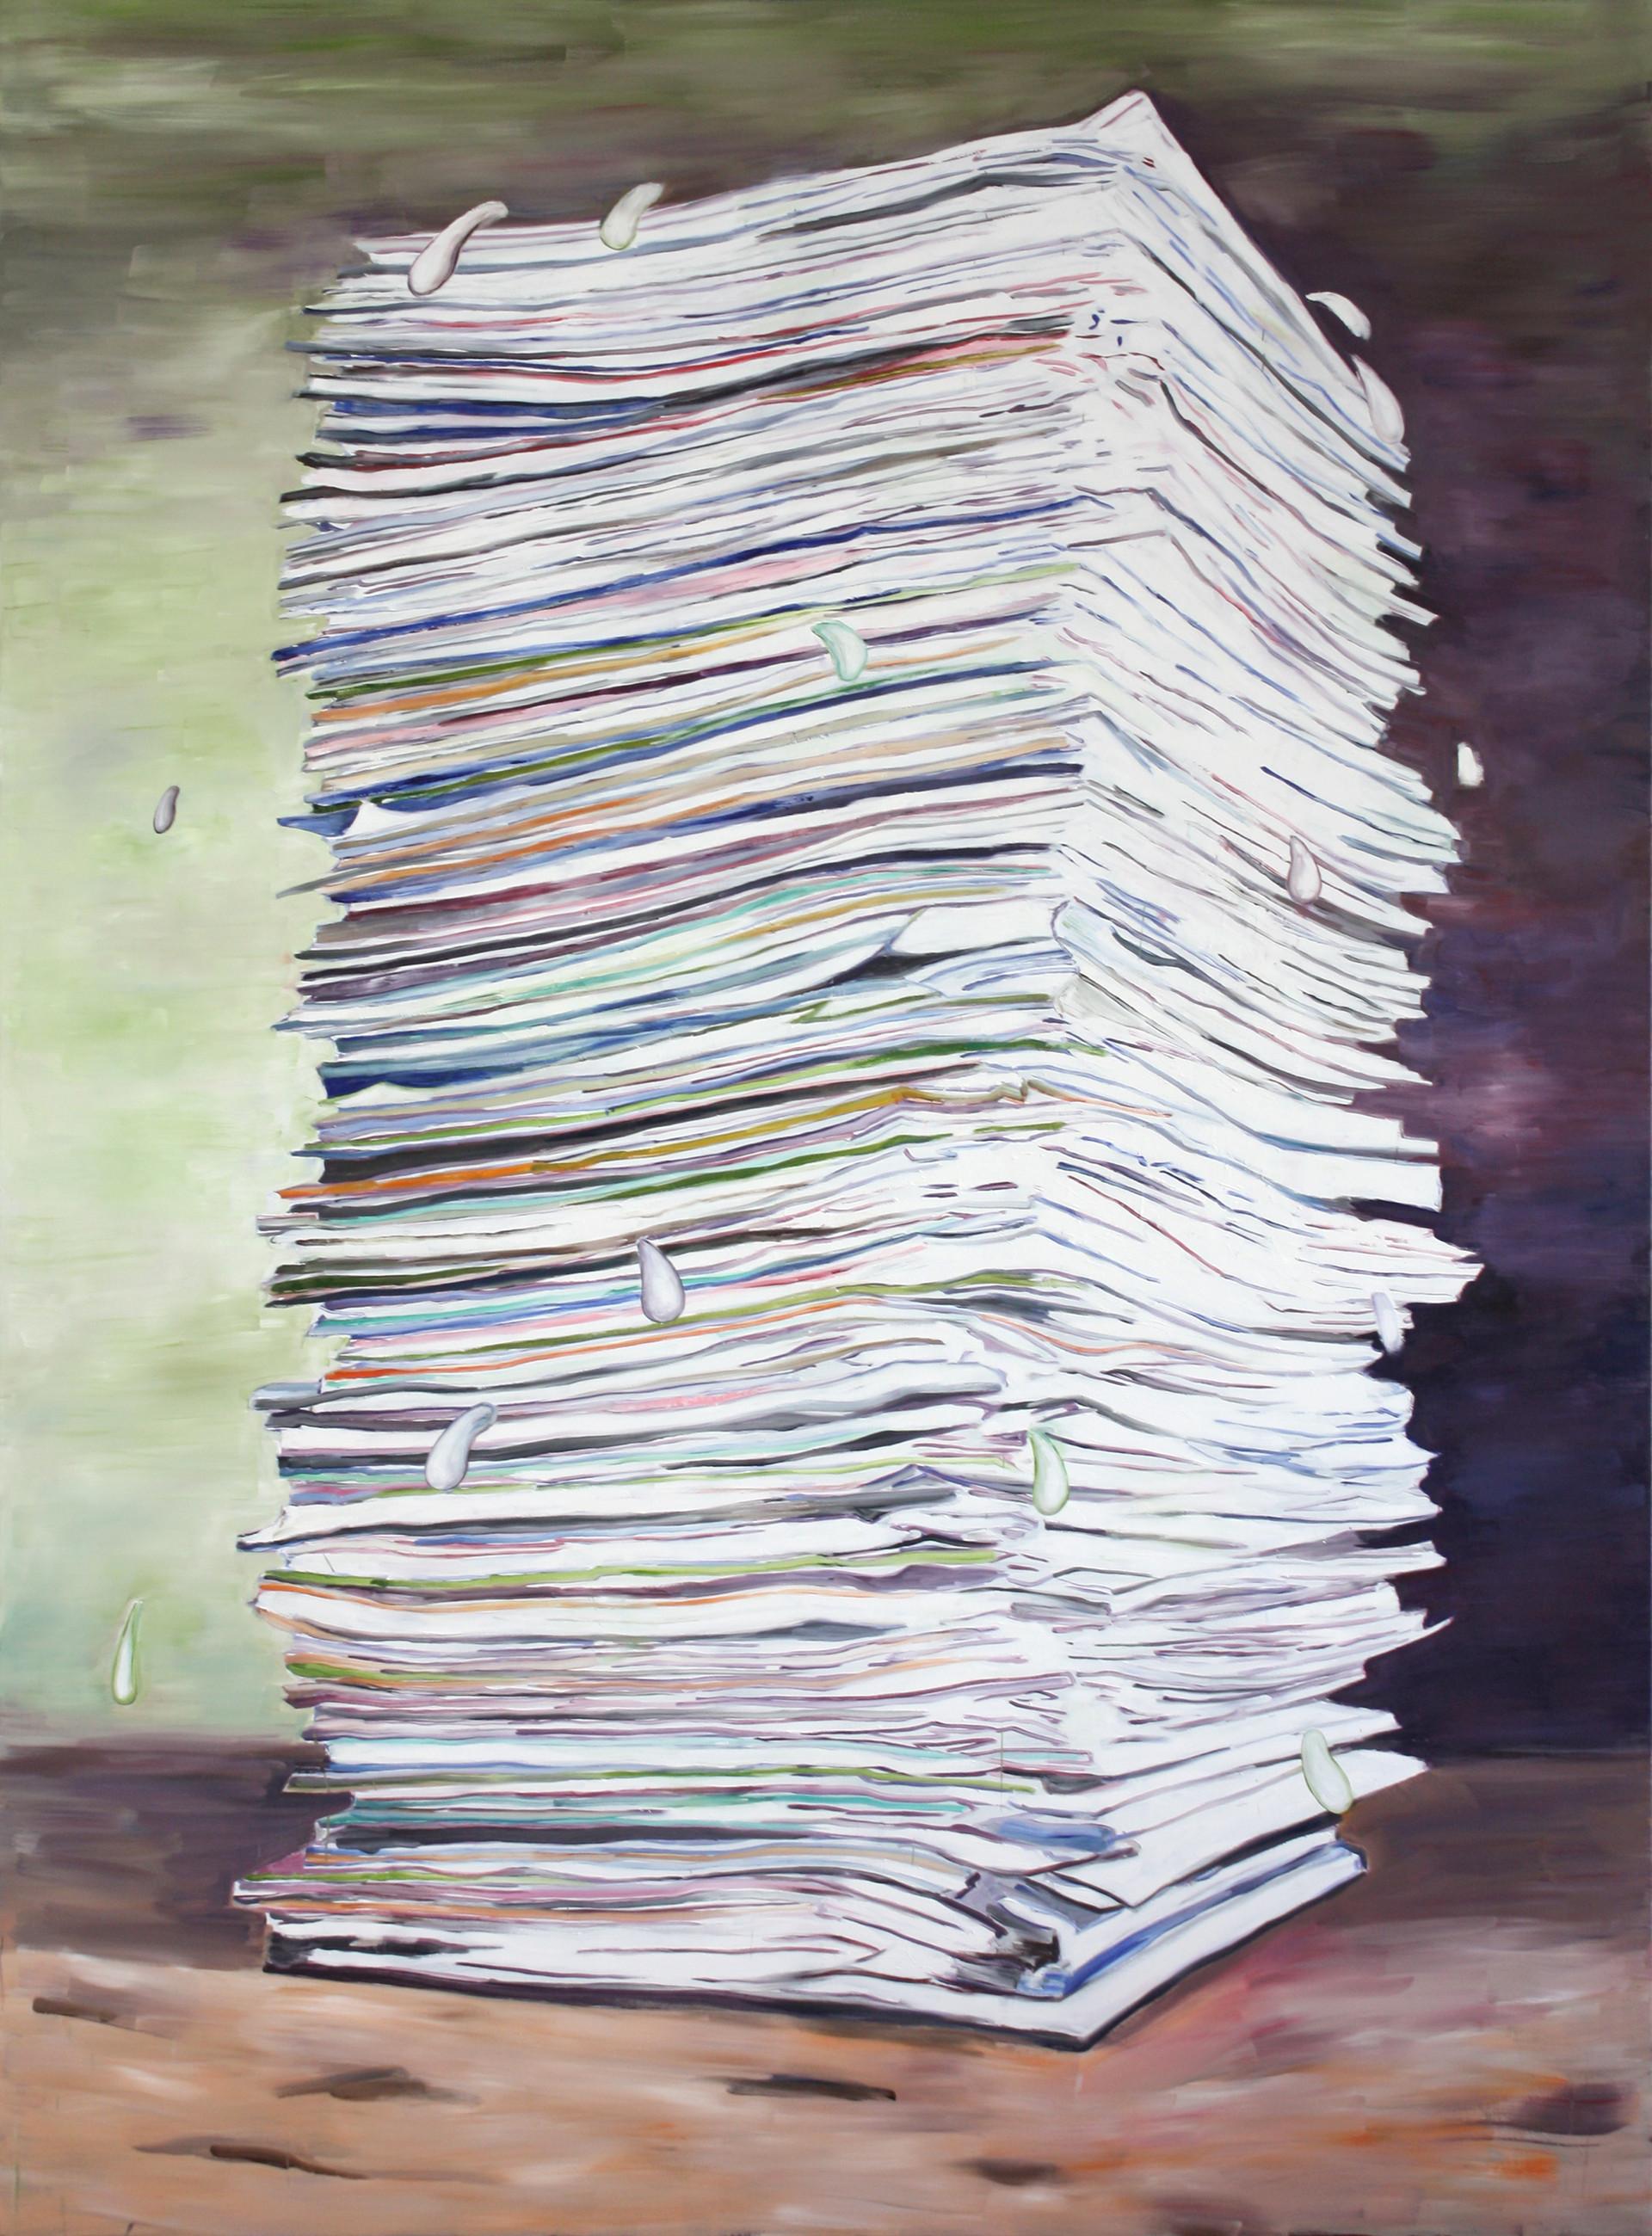 big painting - 2012 - öl auf leinwand - 250 x 180 cm